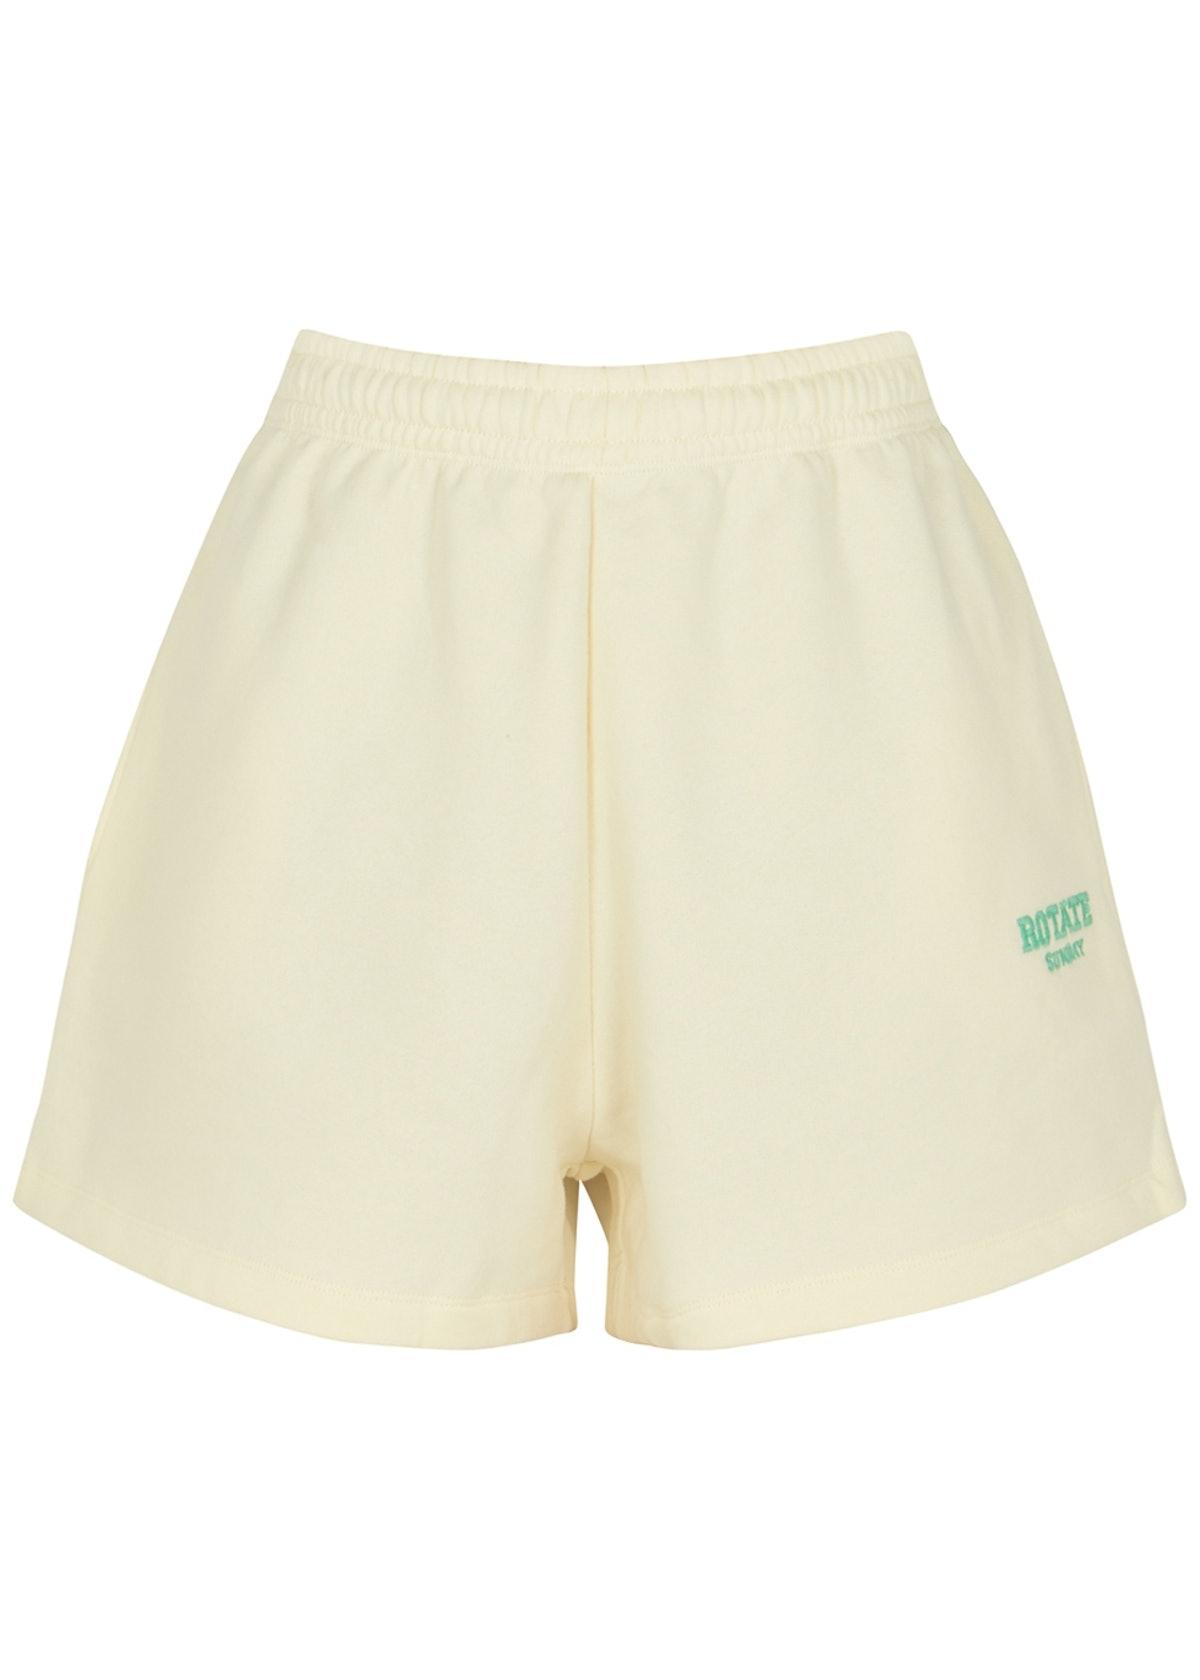 Roda cream logo cotton shorts: image 1